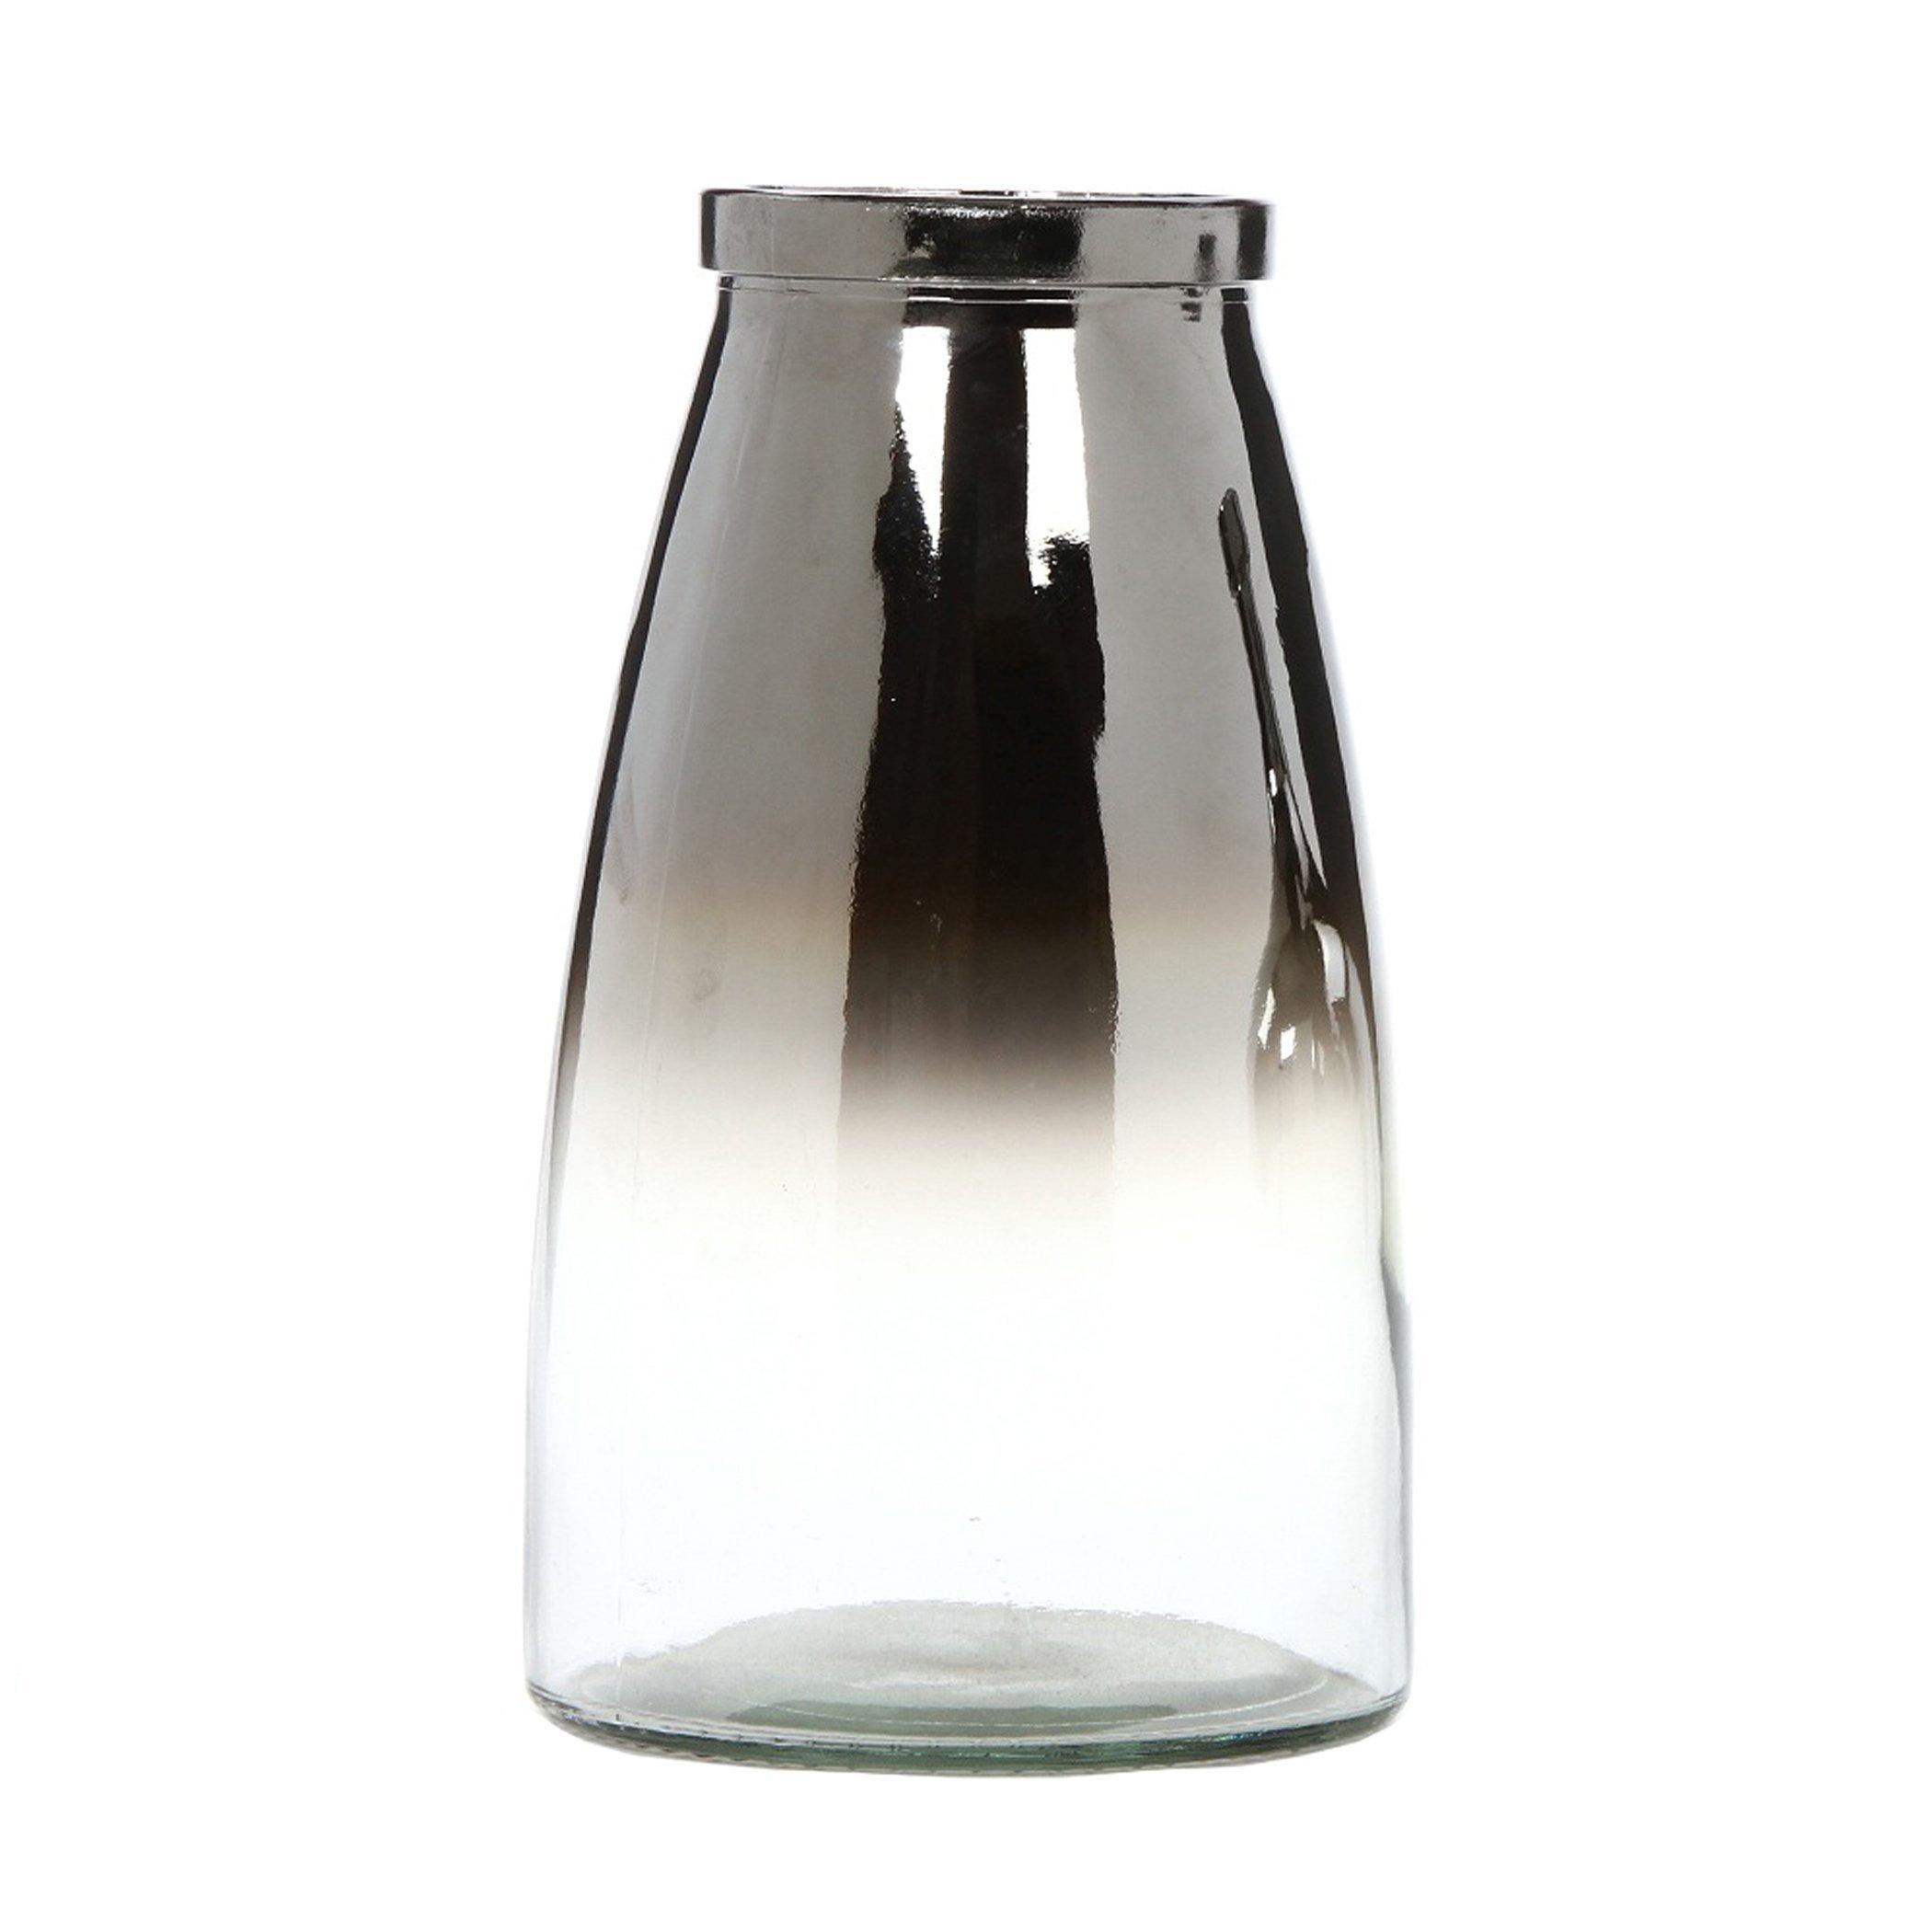 Hosley Silver Glass Flower Vase 10.25 Inch High Ideal Gift for Weddings Bridal Spa Meditation Reiki Rose Vase Nautical Settings Storage P1